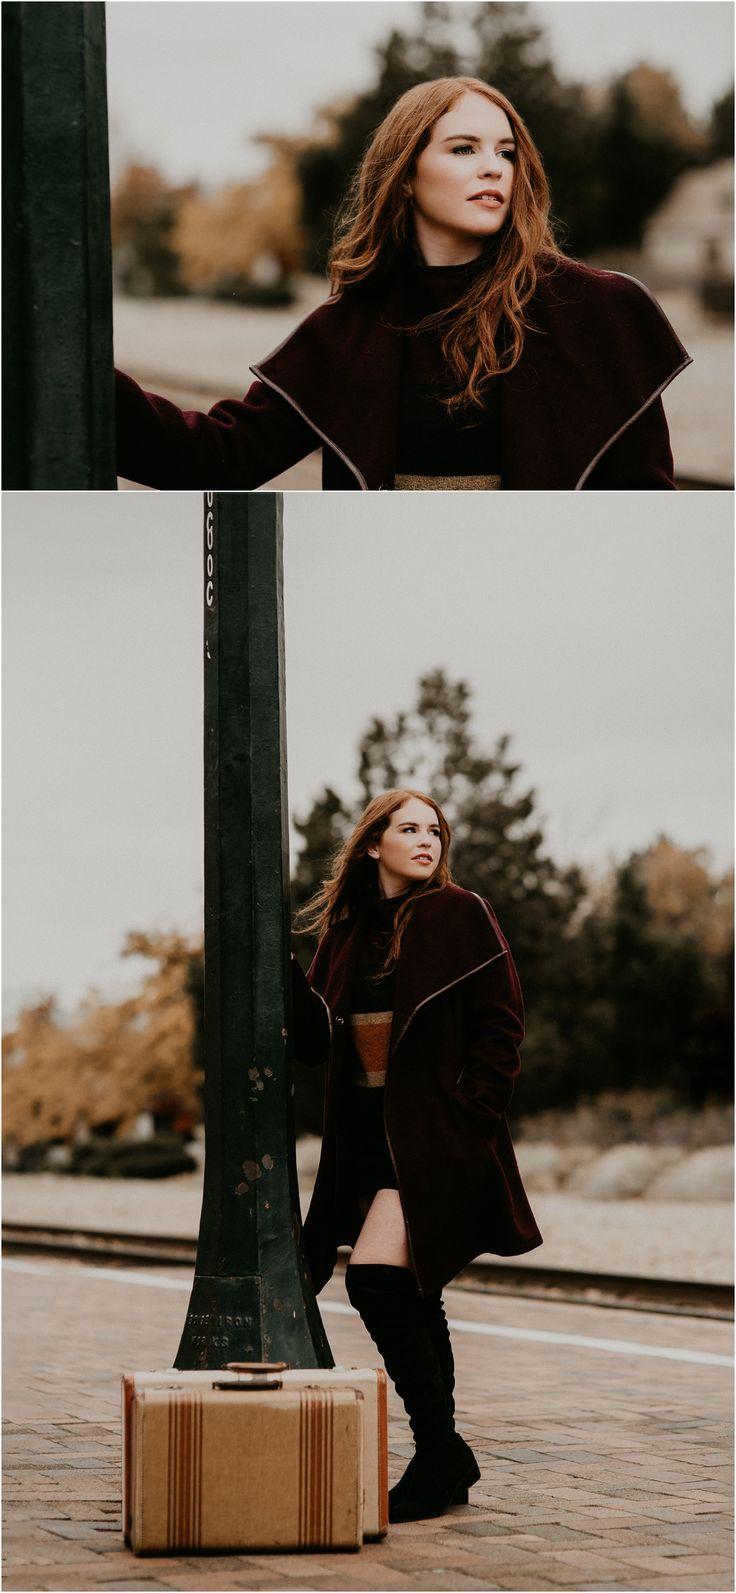 Boise Senior Photographer // Makayla Madden Photography // Eagle High Senior // Red Head // Fall Senior Pics // Fall Senior Picture Outfit and Location Ideas and Inspiration // Urban Senior Pictures // Senior Photography // Vintage Suitcases // Vintage Senior Session // Senior Girl //